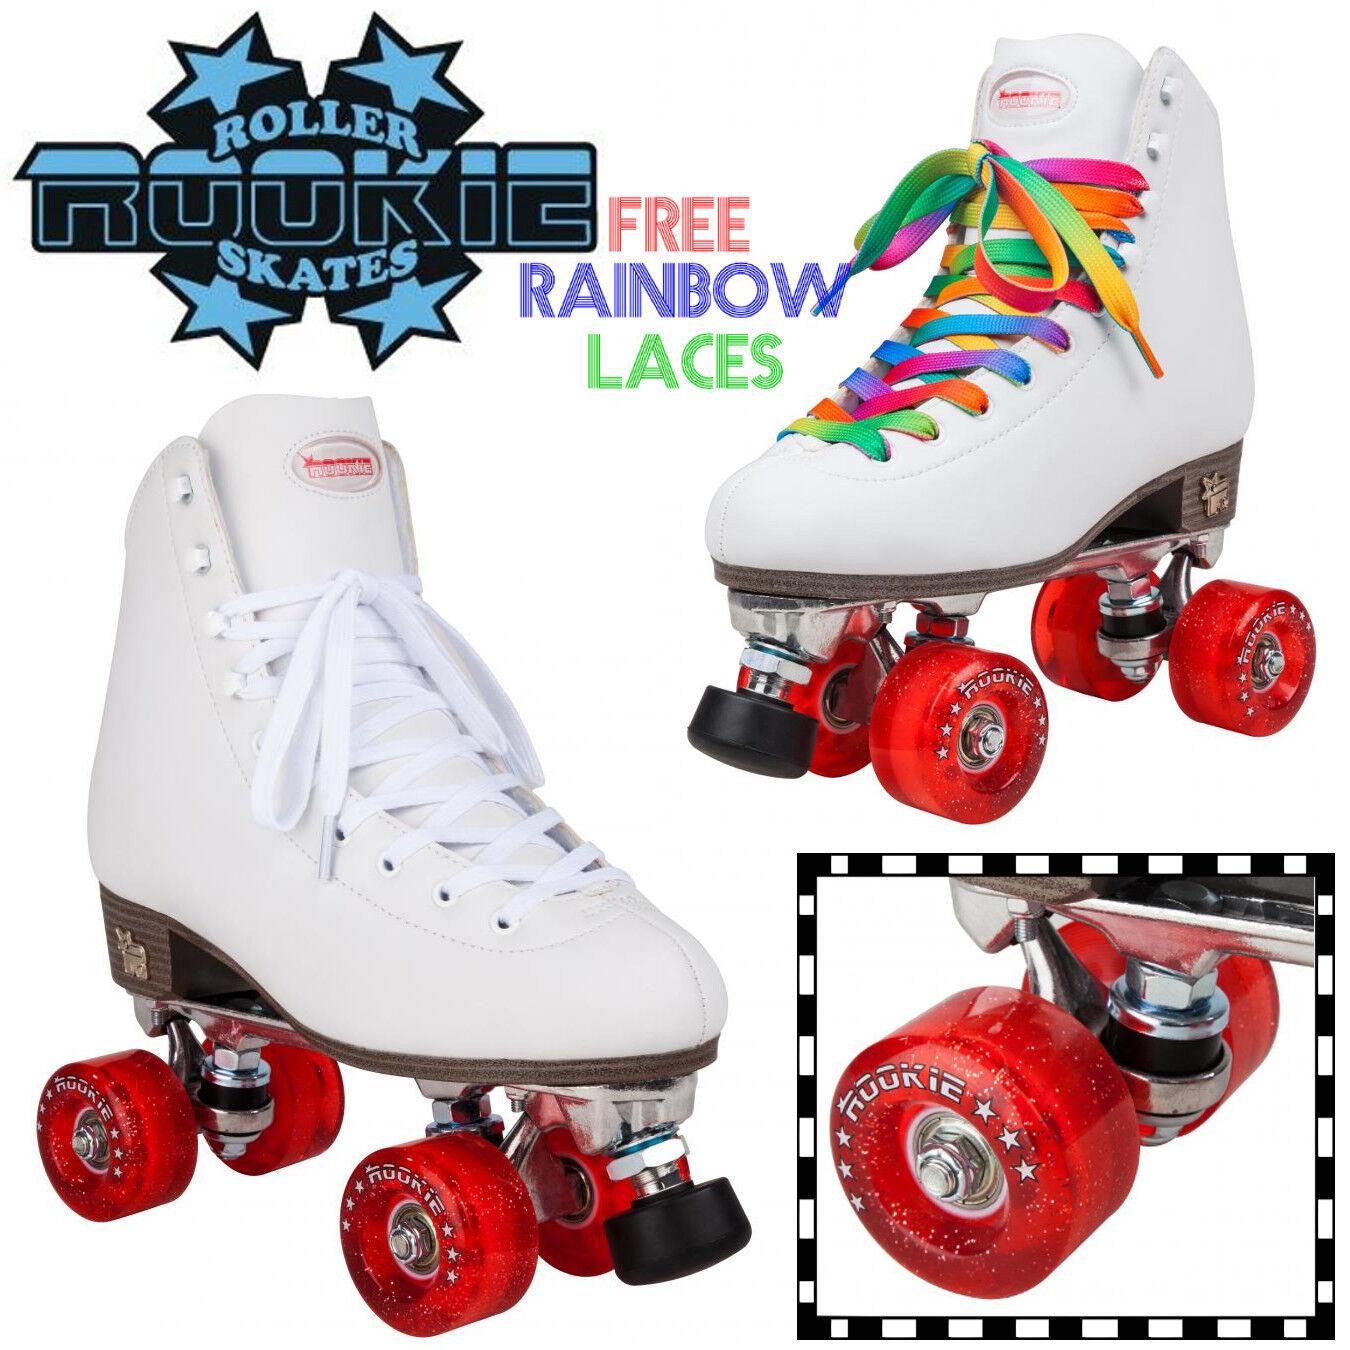 Rookie Classic Weiß Quad Roller Skates Kids Damenschuhe Roller Derby Derby Roller 360aaf